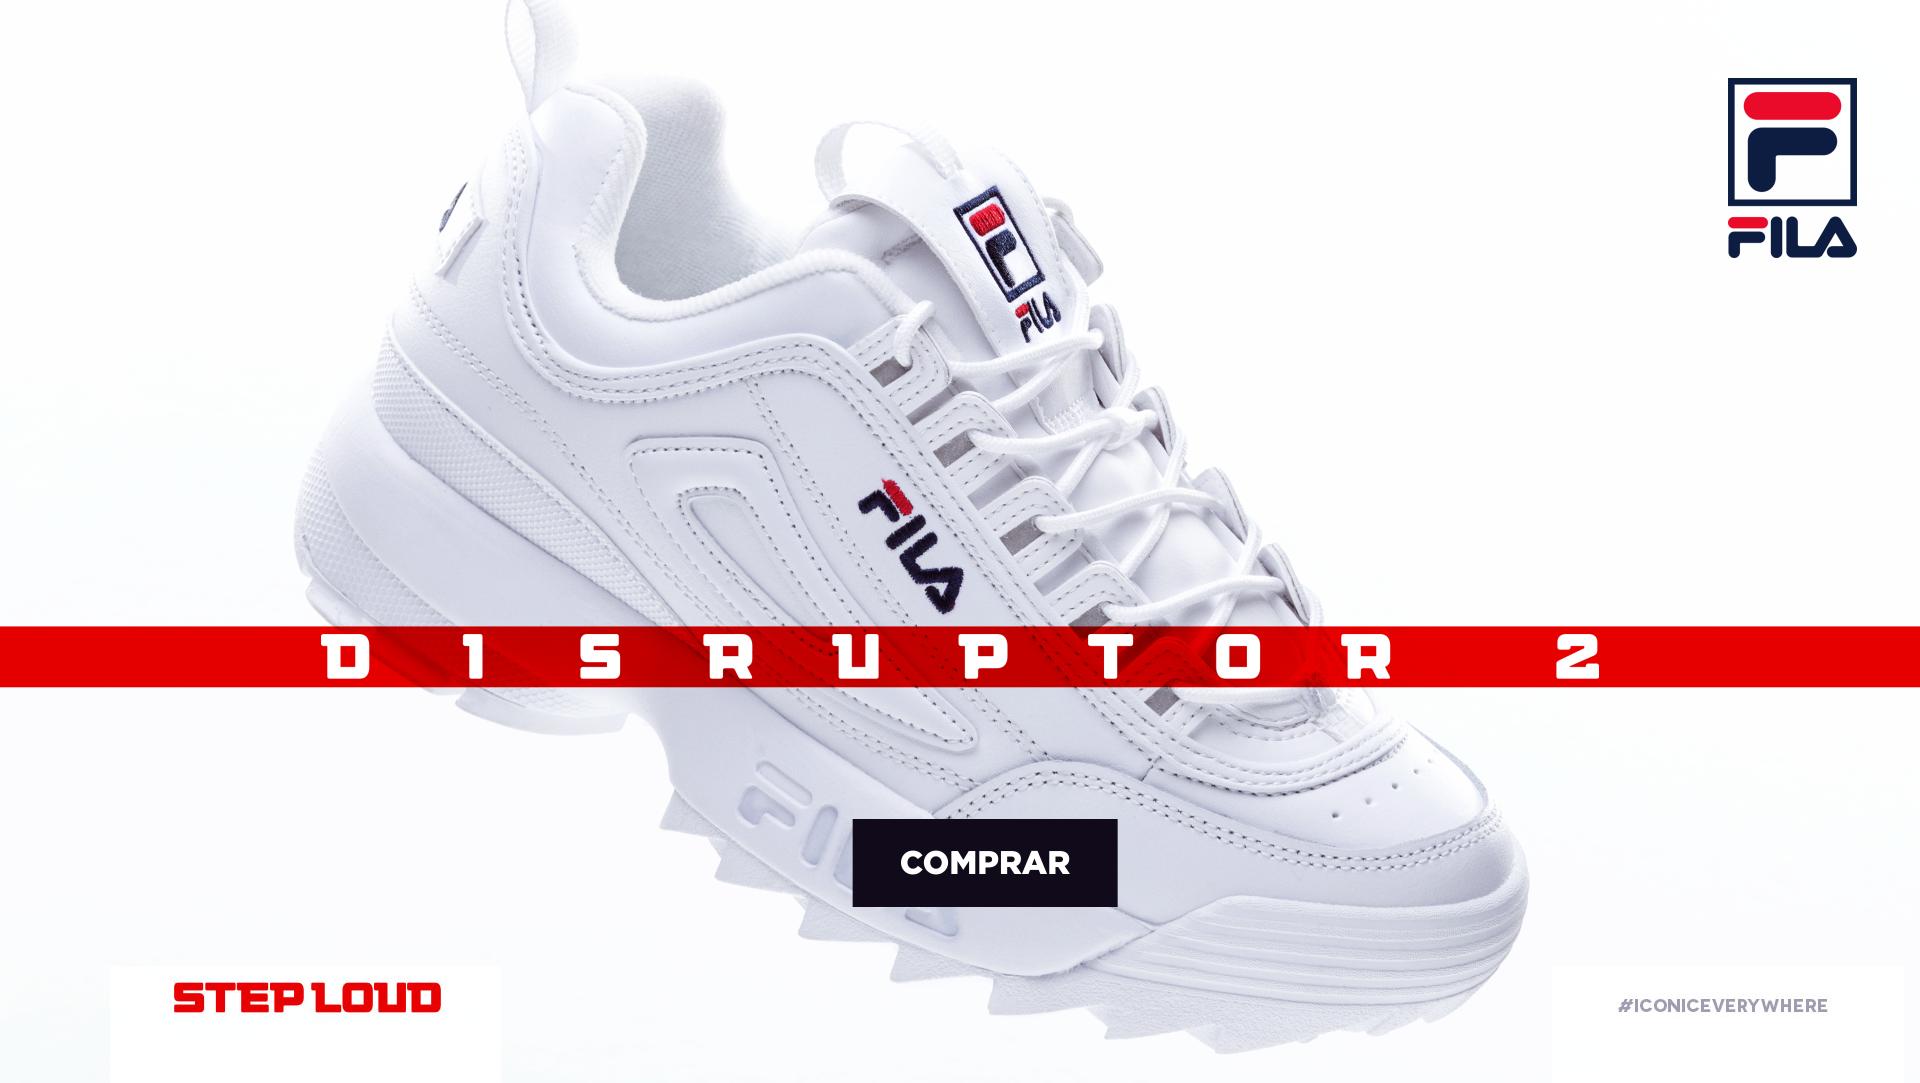 disruptor 2